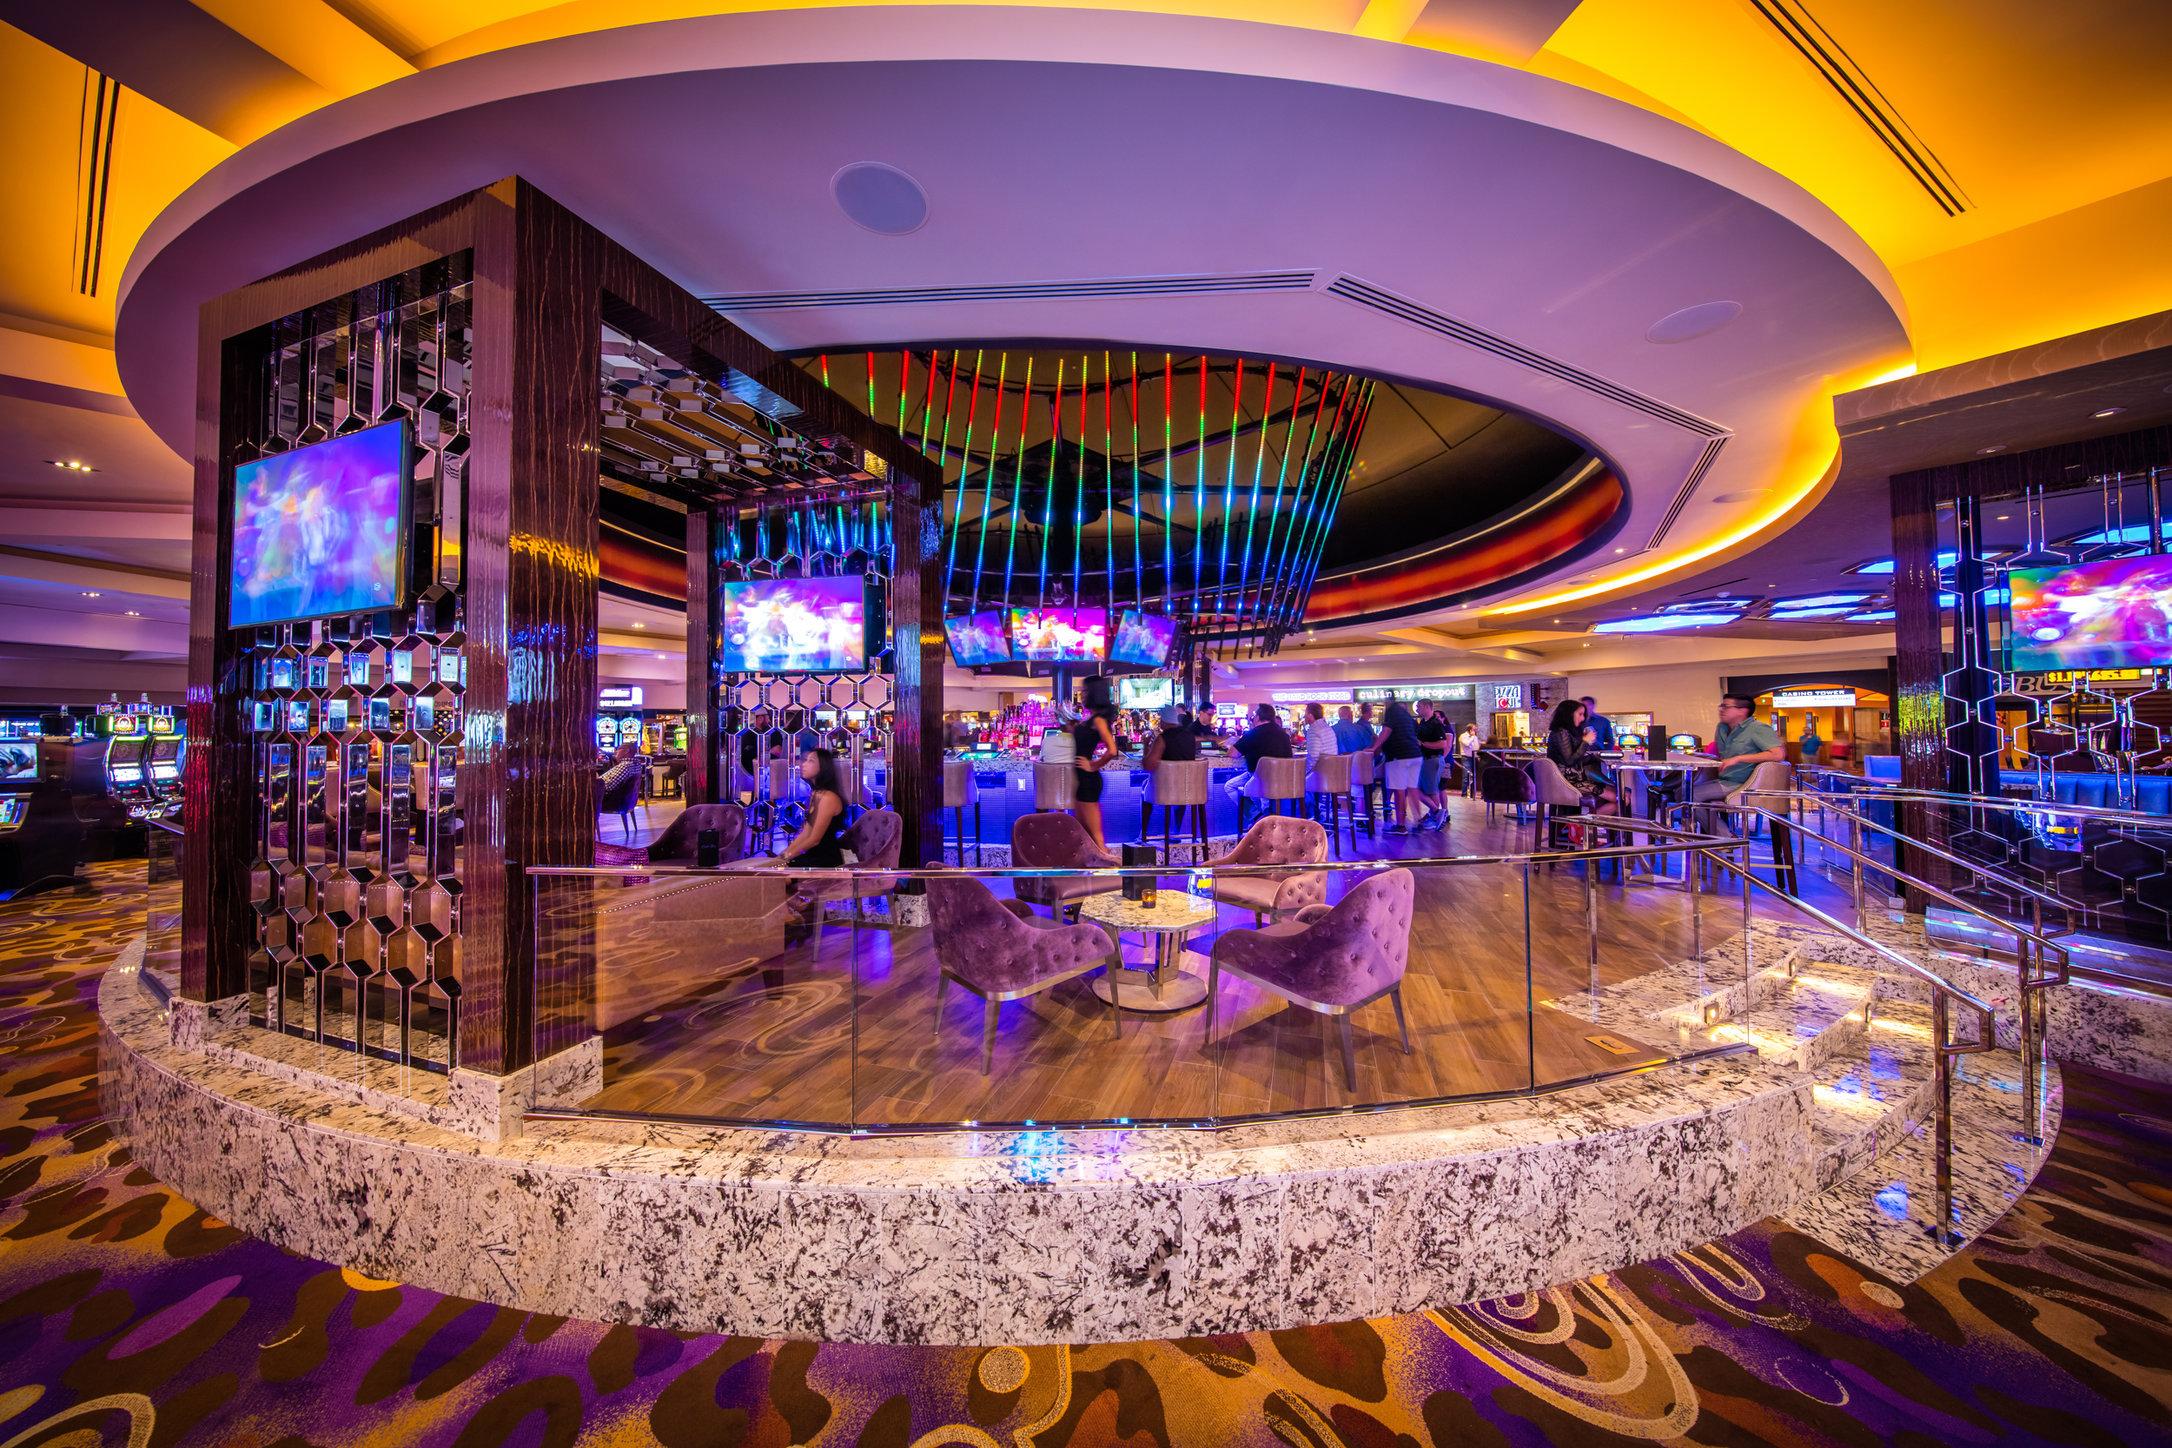 09_21_15_hrh_casino_cent_bar_editorial_kabik-279-LAYERS.jpg